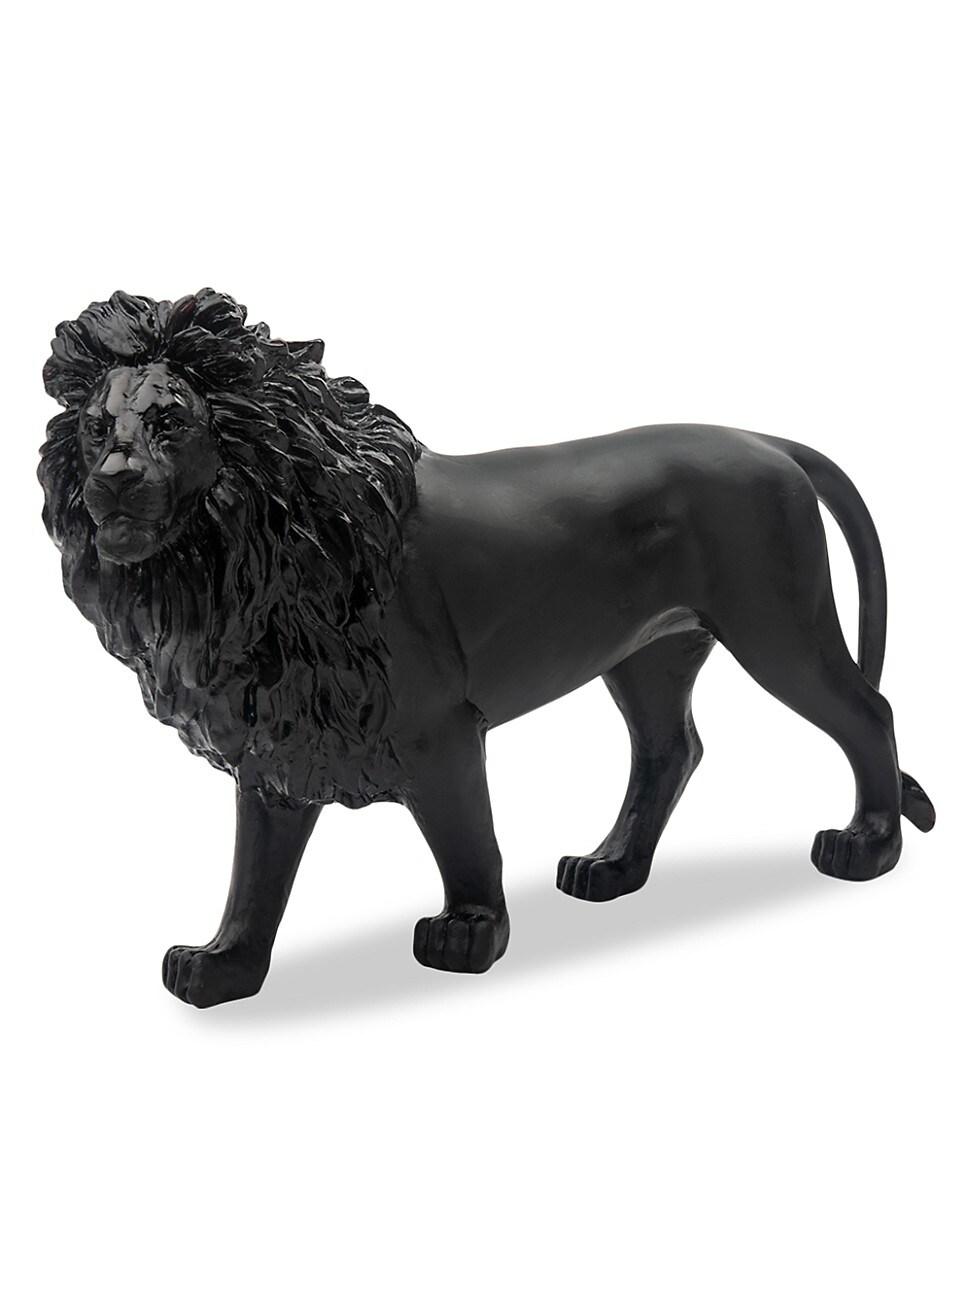 Daum Clothing ANIMALS SAND LION SCULPTURE